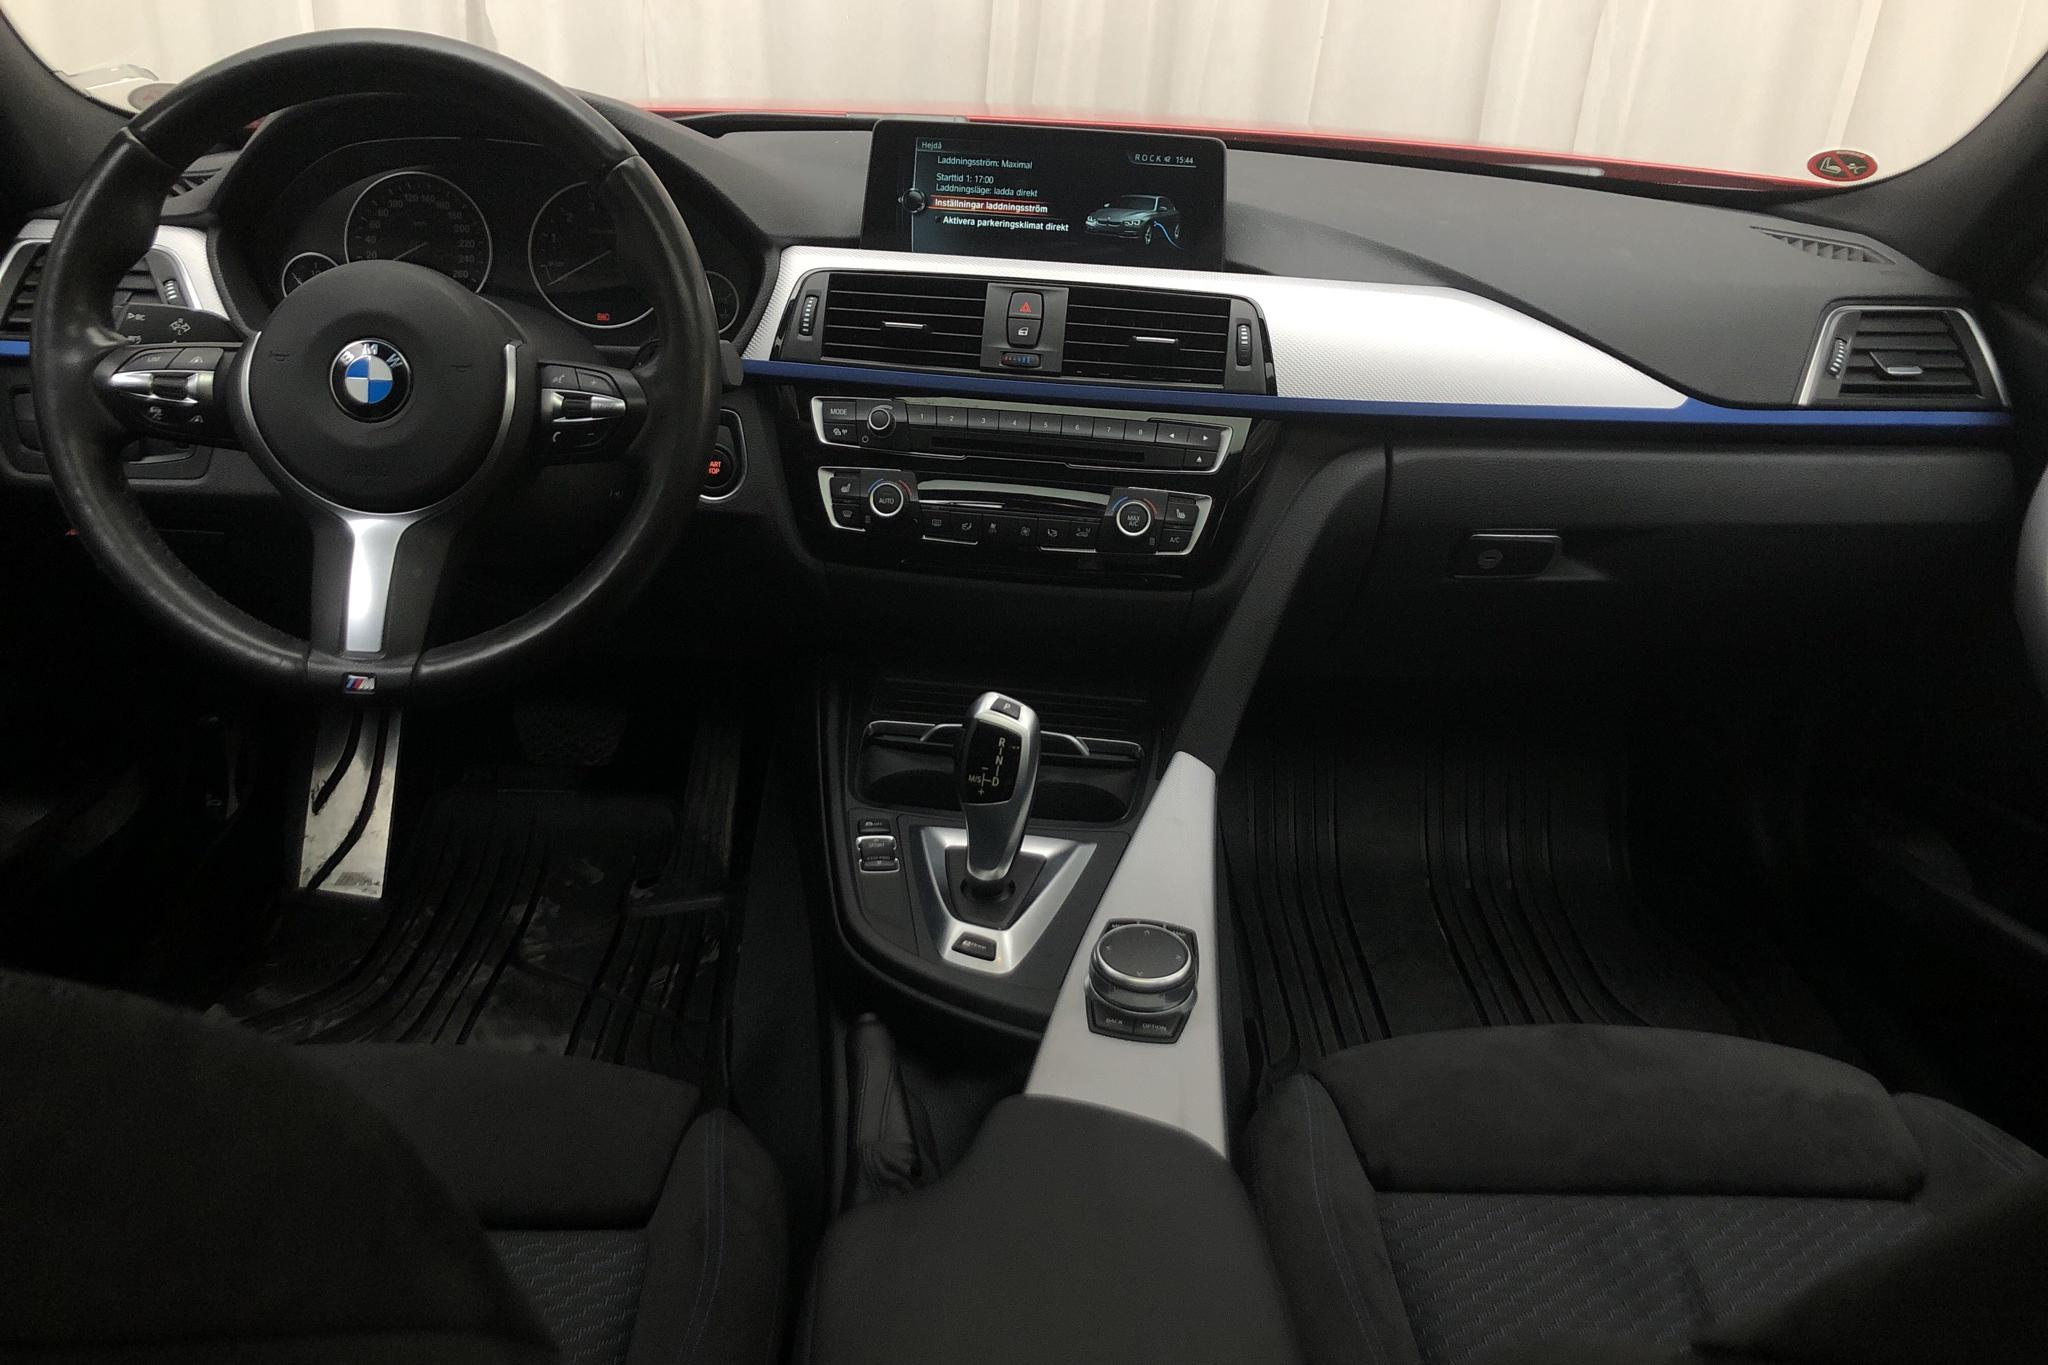 BMW 330e Sedan, F30 (252hk) - 60 850 km - Automatic - red - 2017